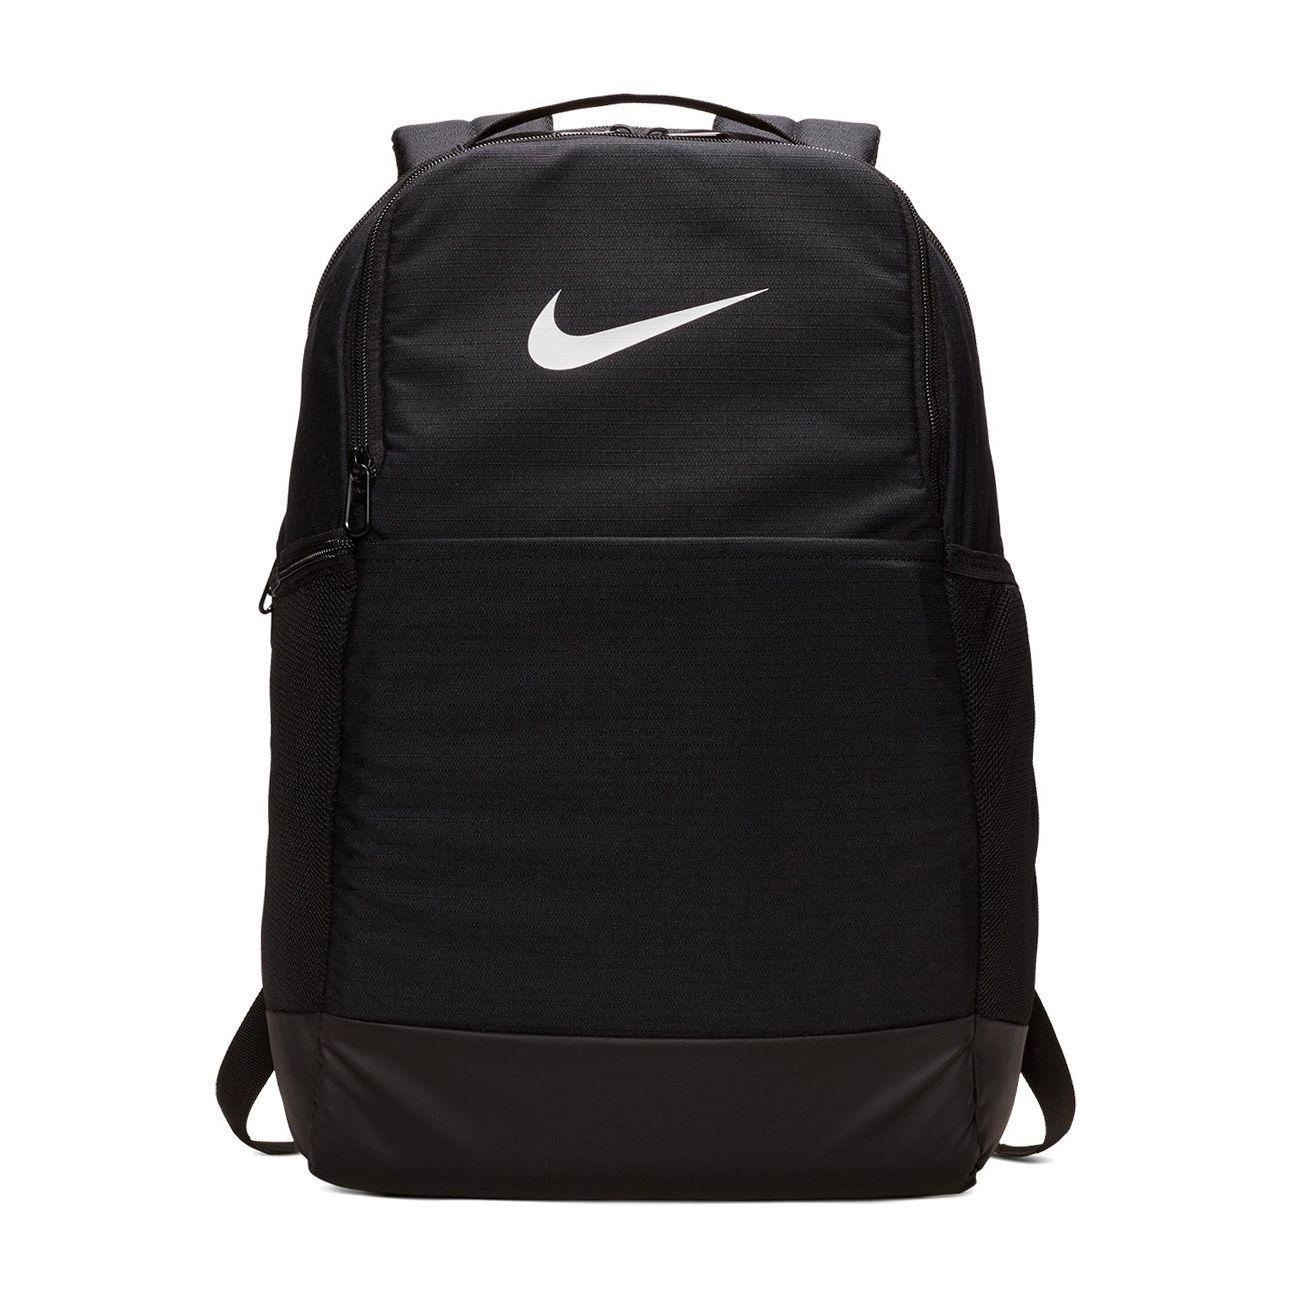 Mochila Nike Brasilia 9.0 Preto